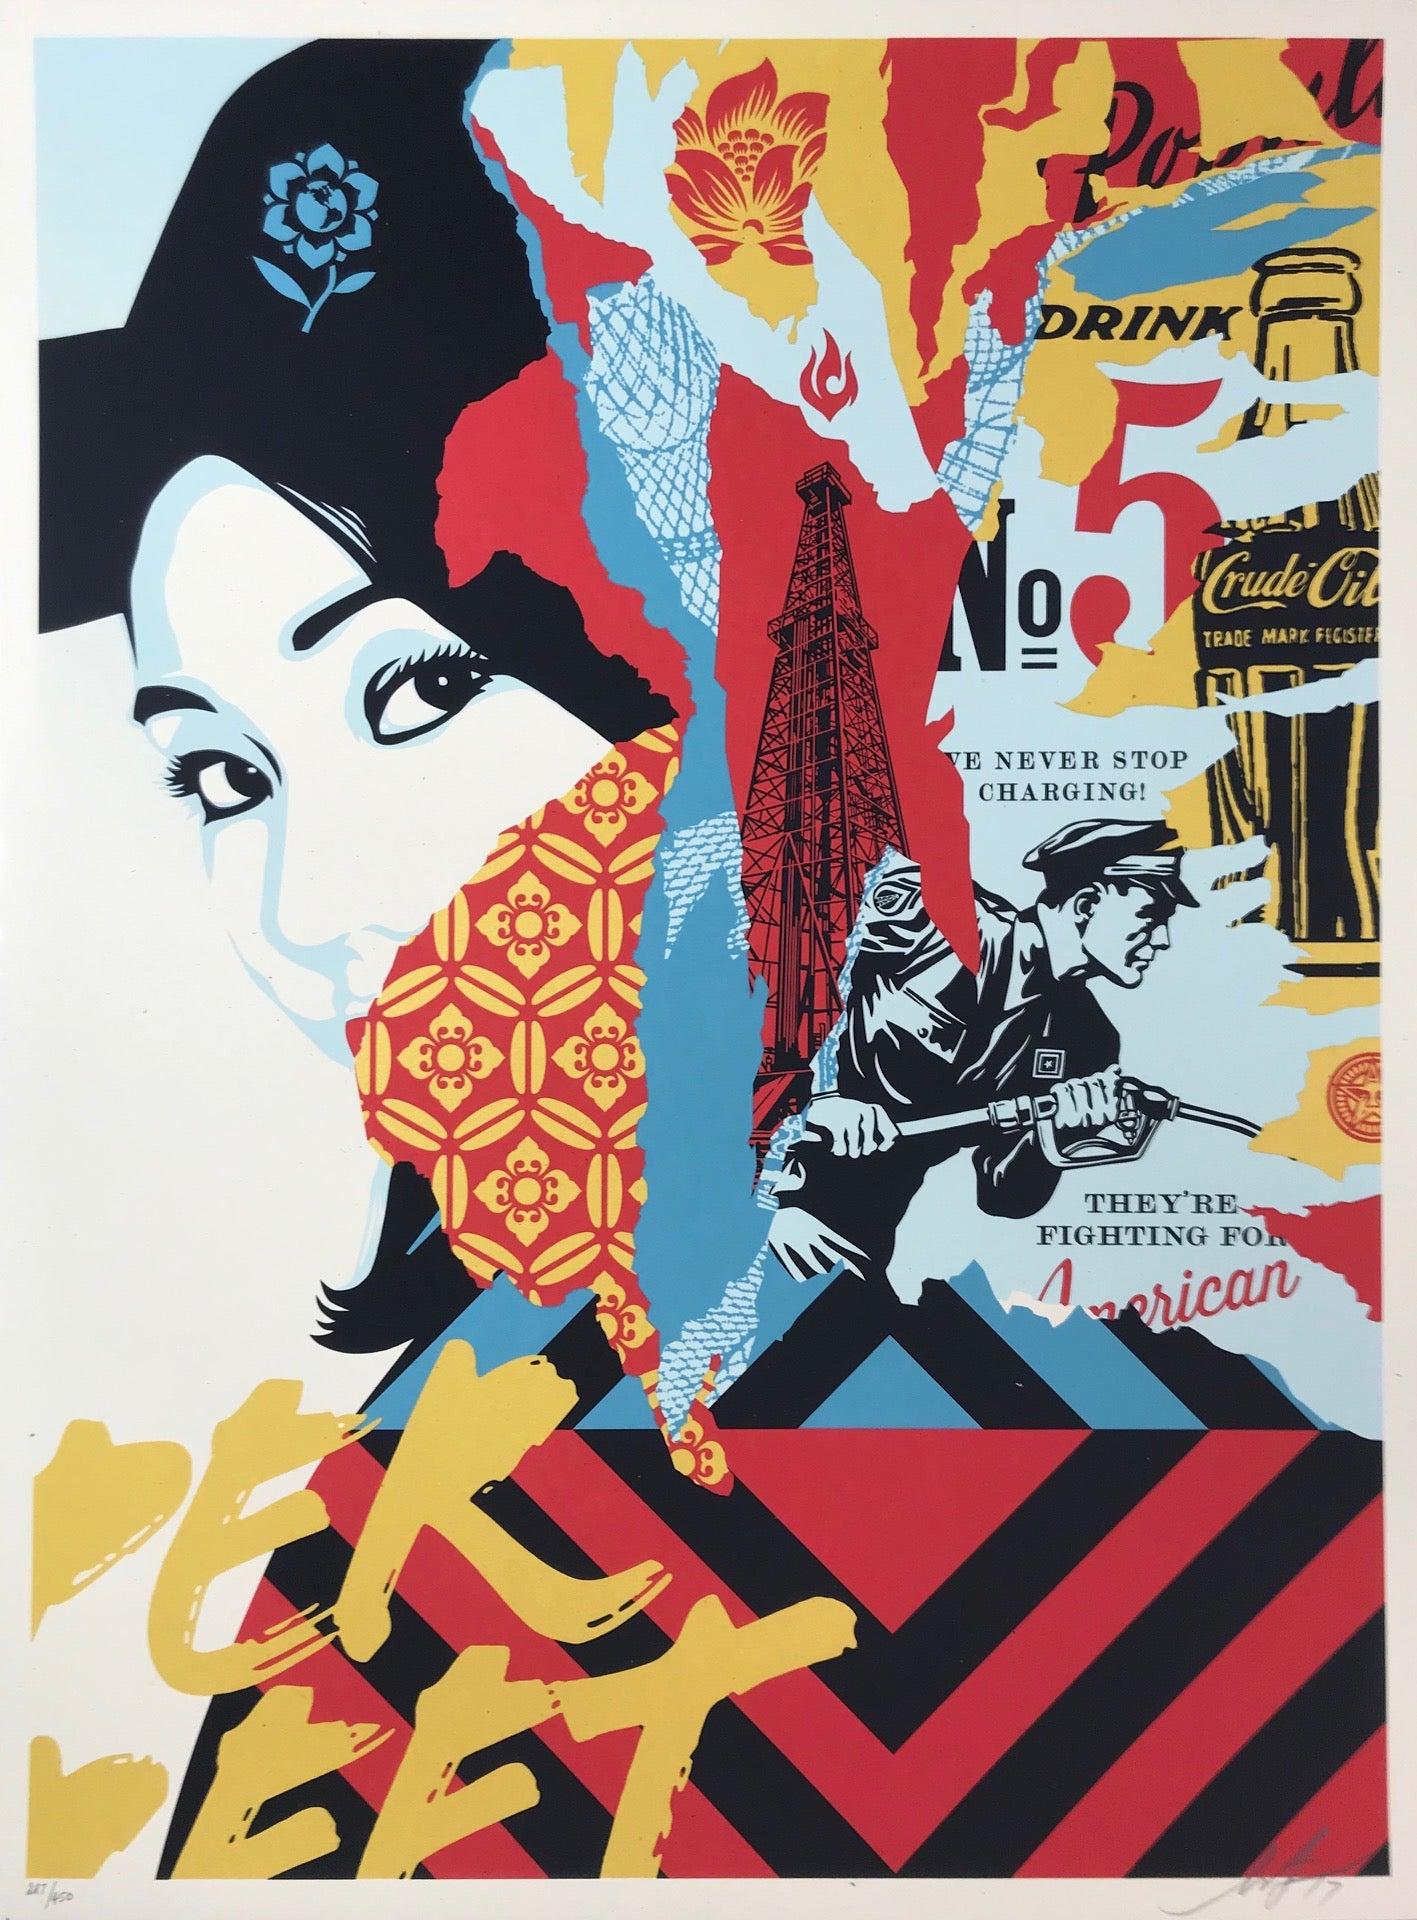 Shepard Fairey Drink Crude Oil Print Obey Giant Poster 2017 Street Art Pop Art